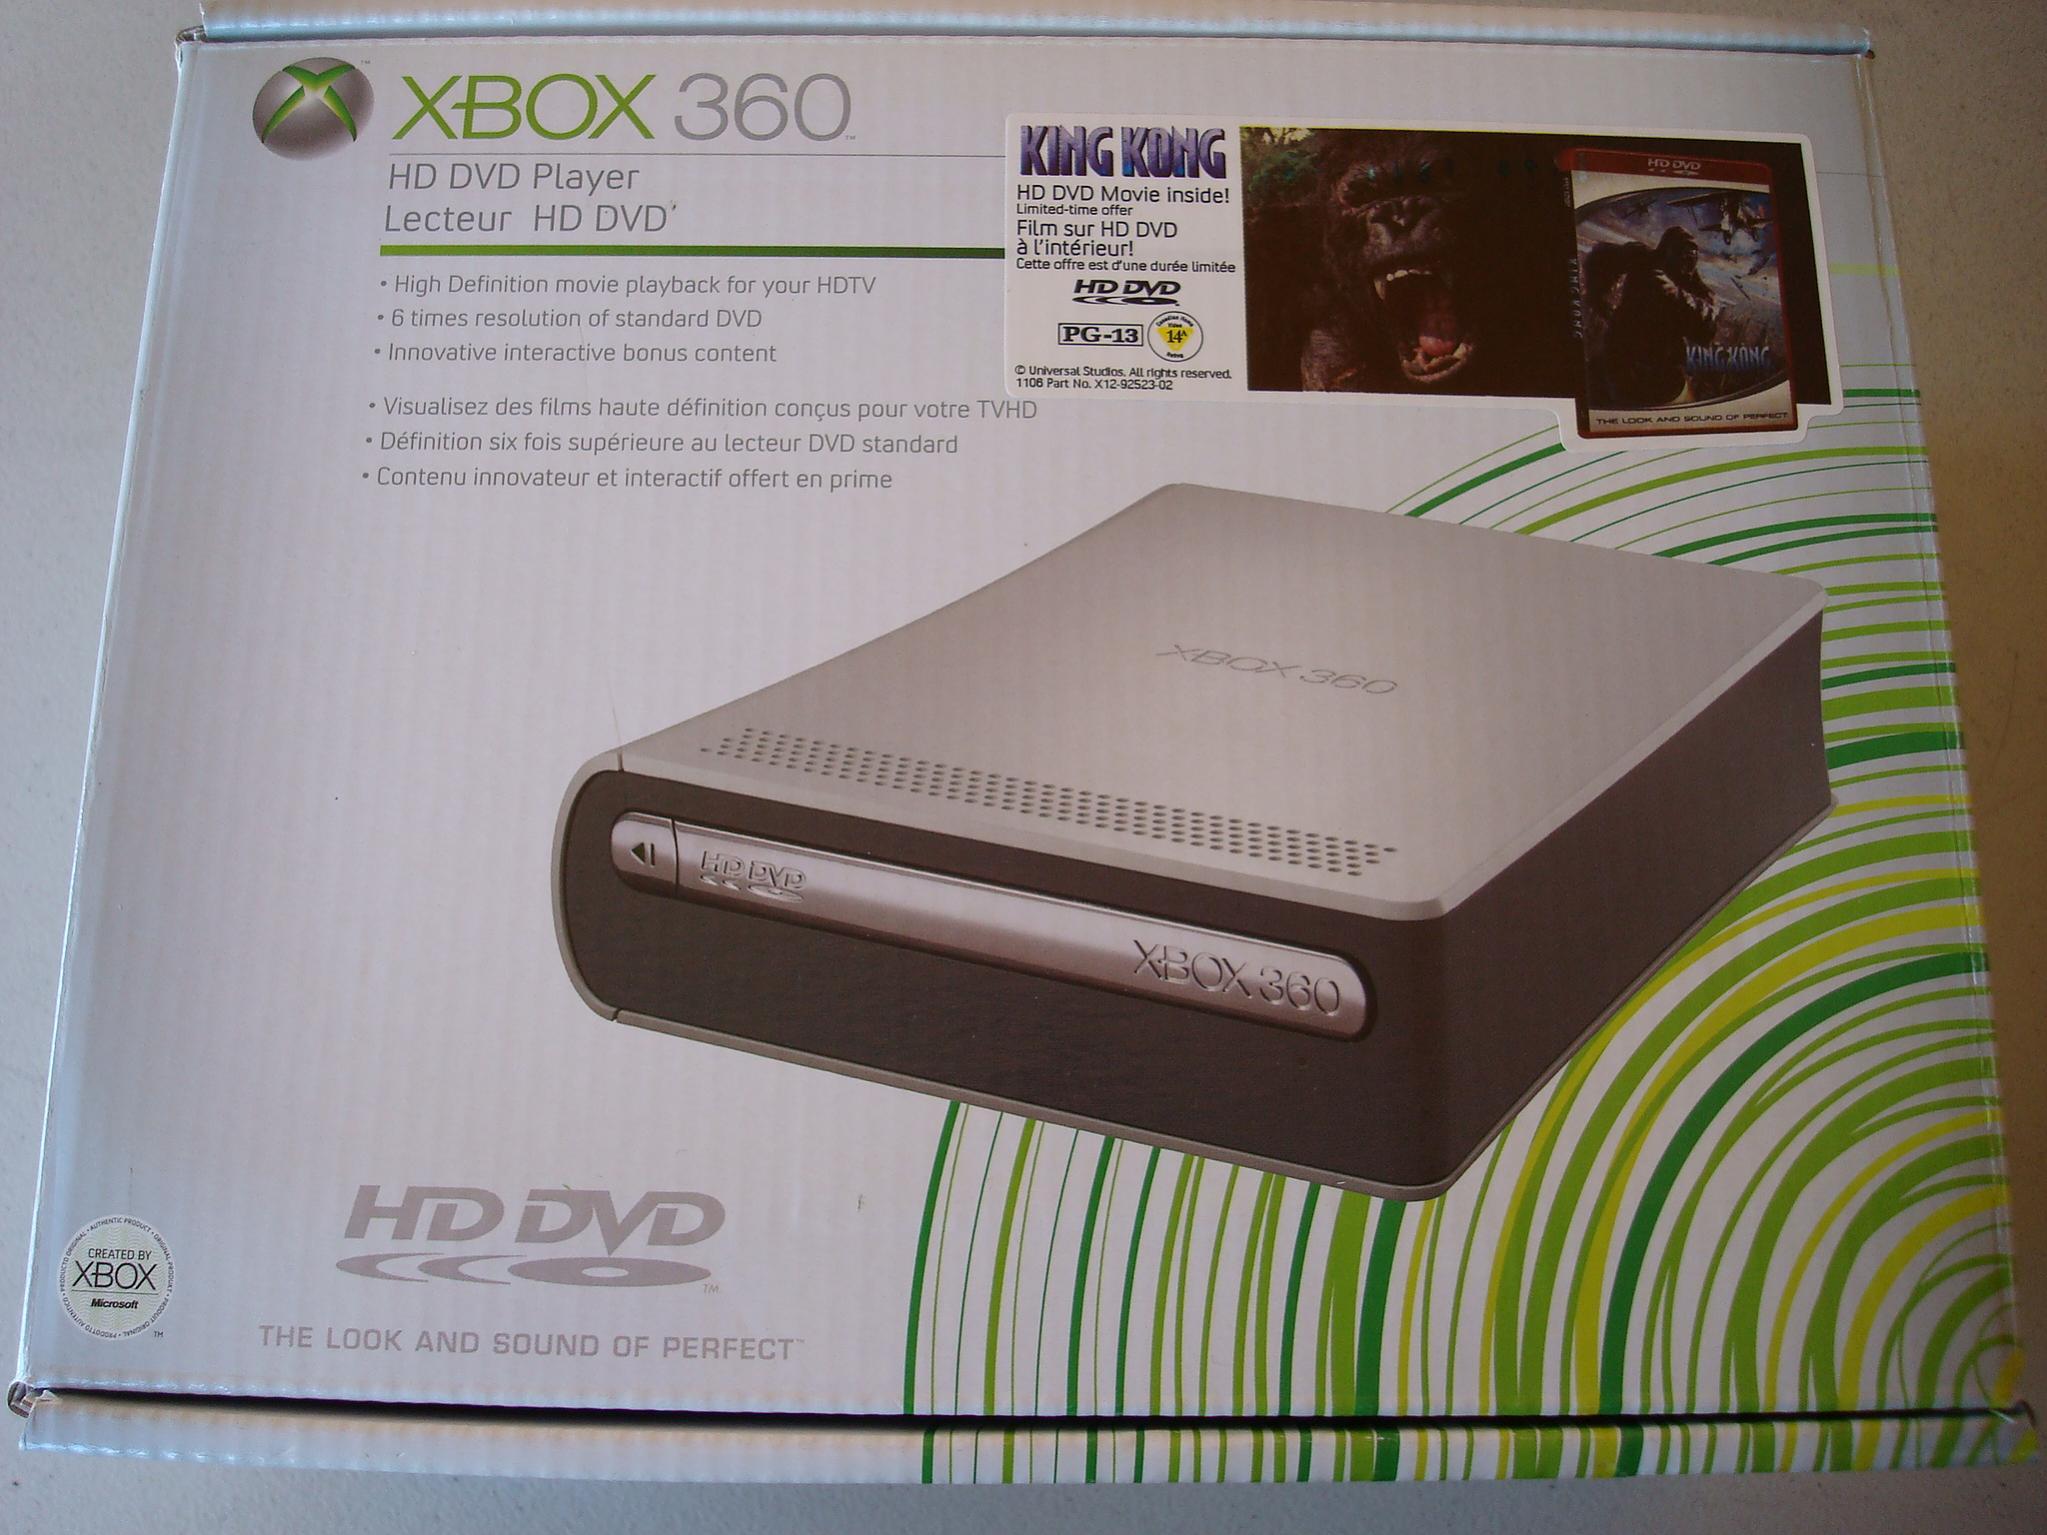 XBOX 360 HD dvd player w/ remote & movie - R/C Tech Forums